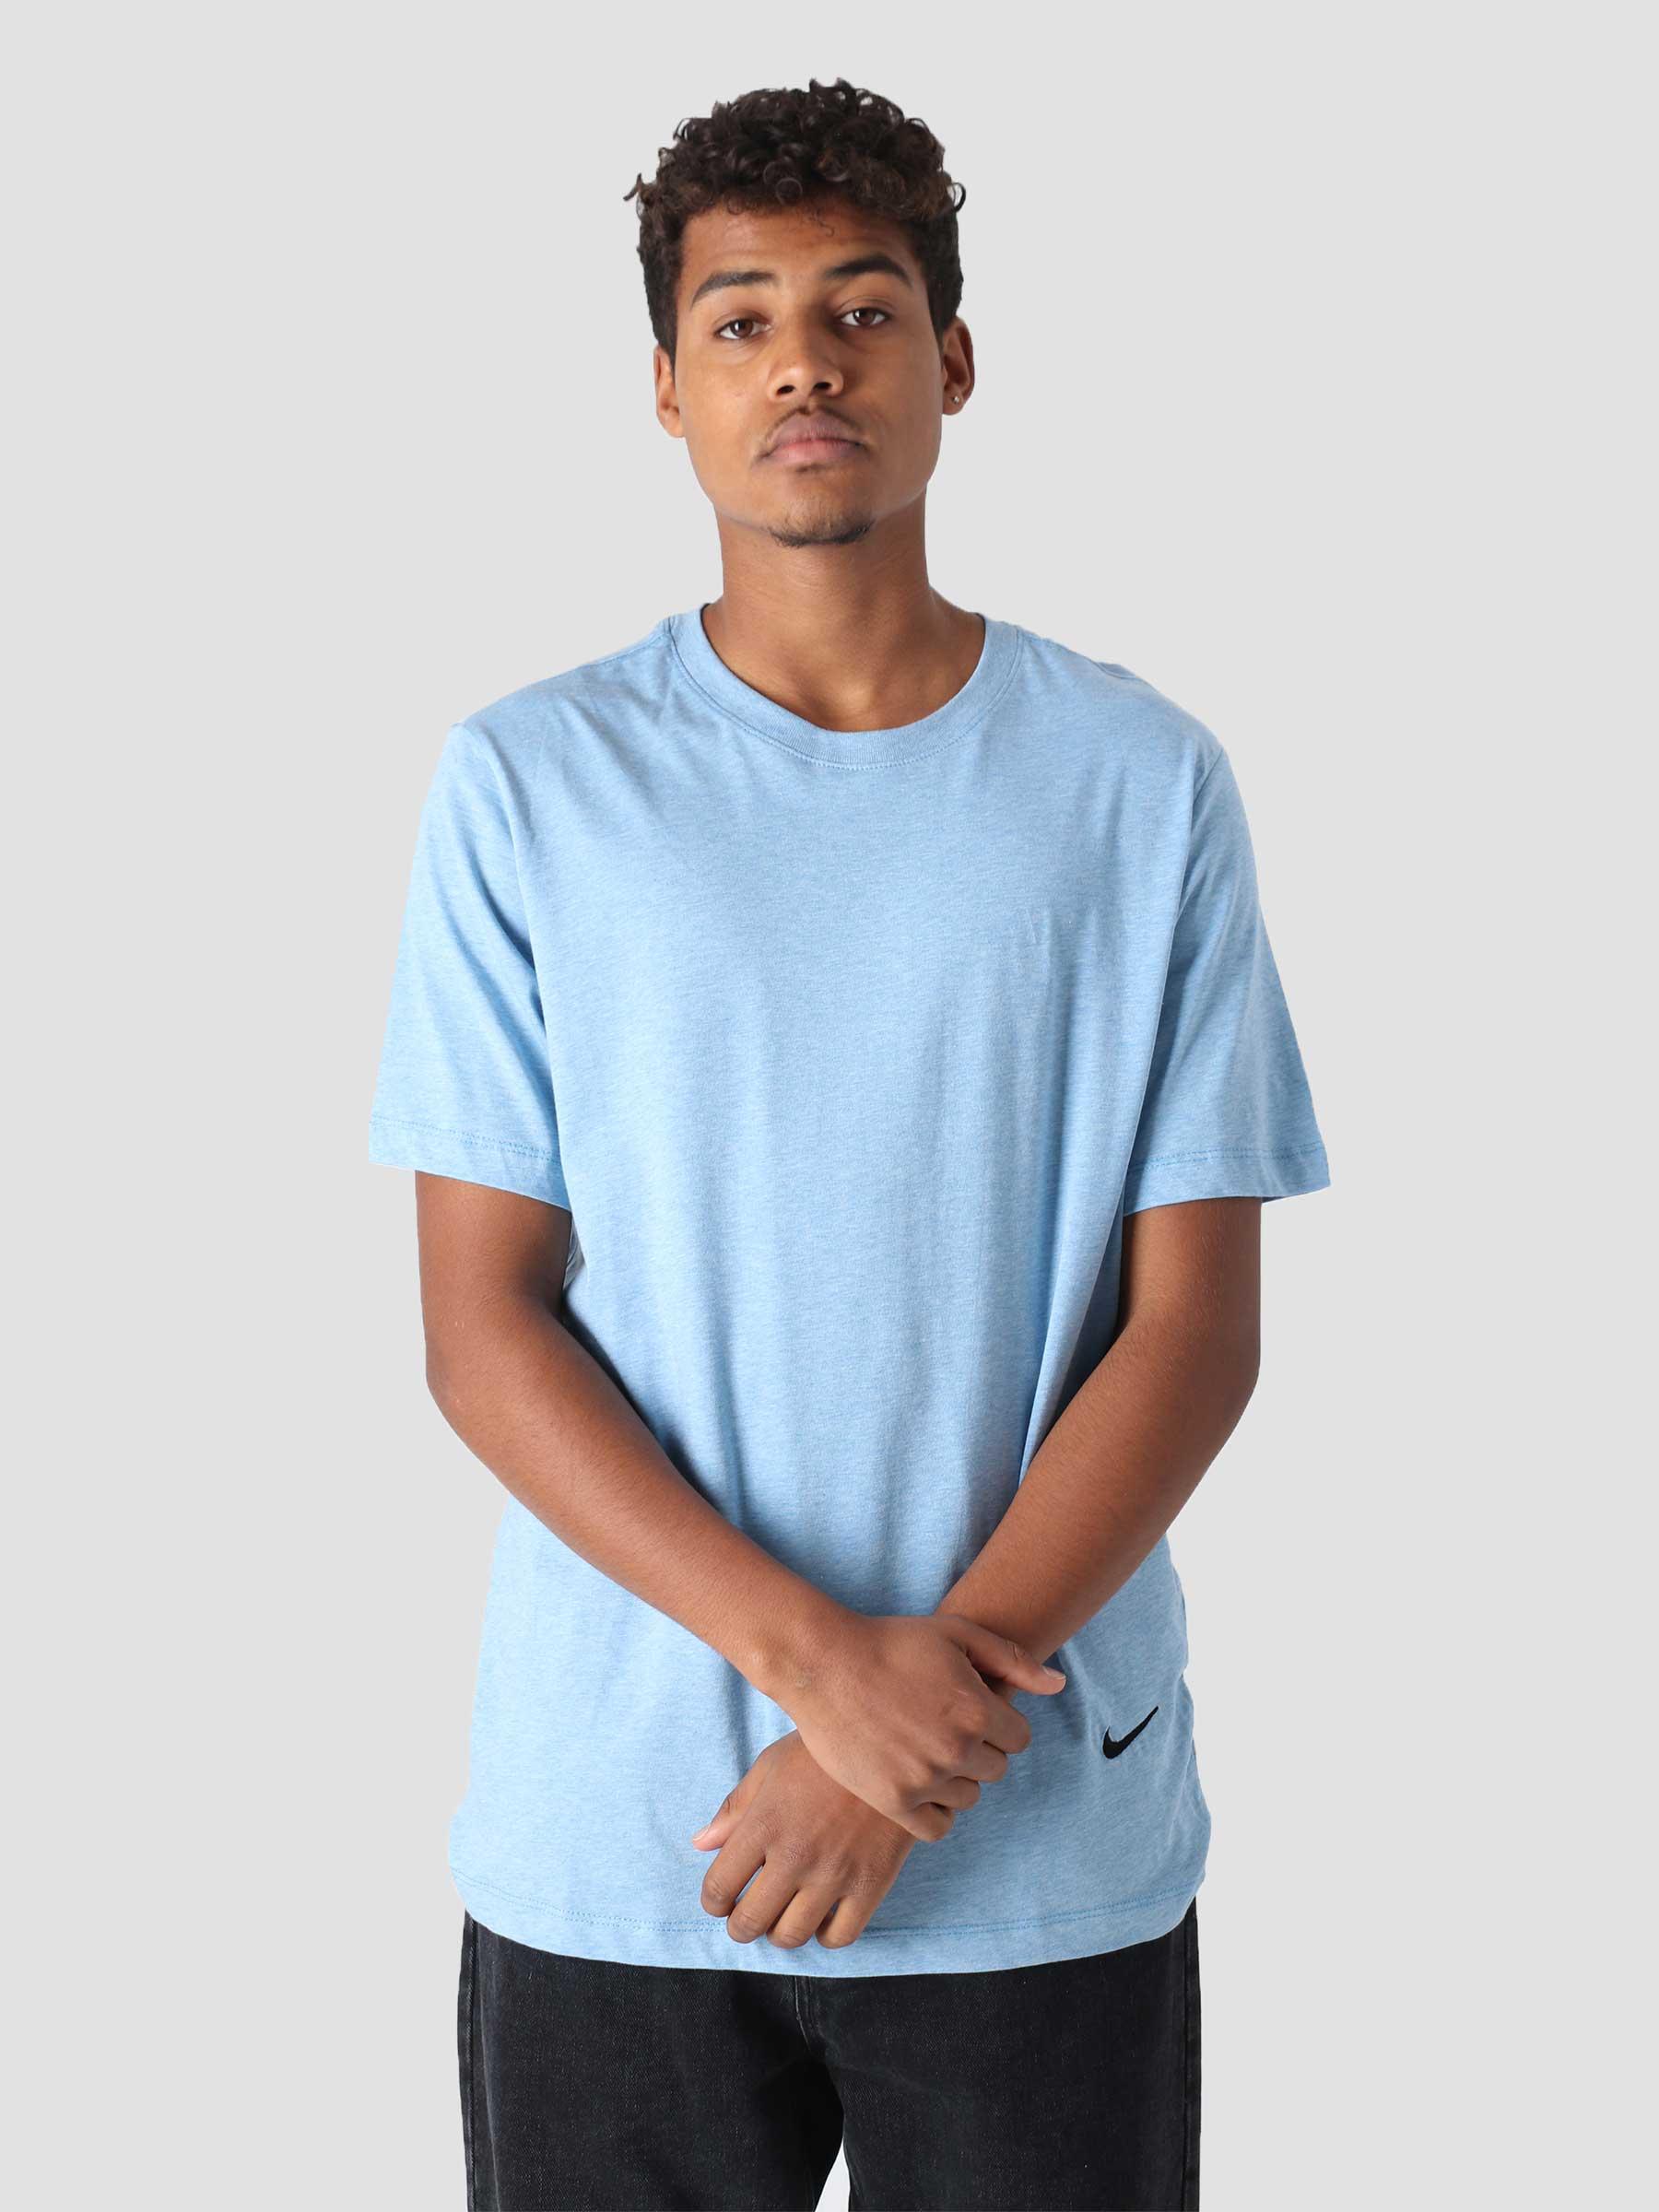 M NSW T-Shirt Sustainability Dutch Blue Htr Black DM2386-469